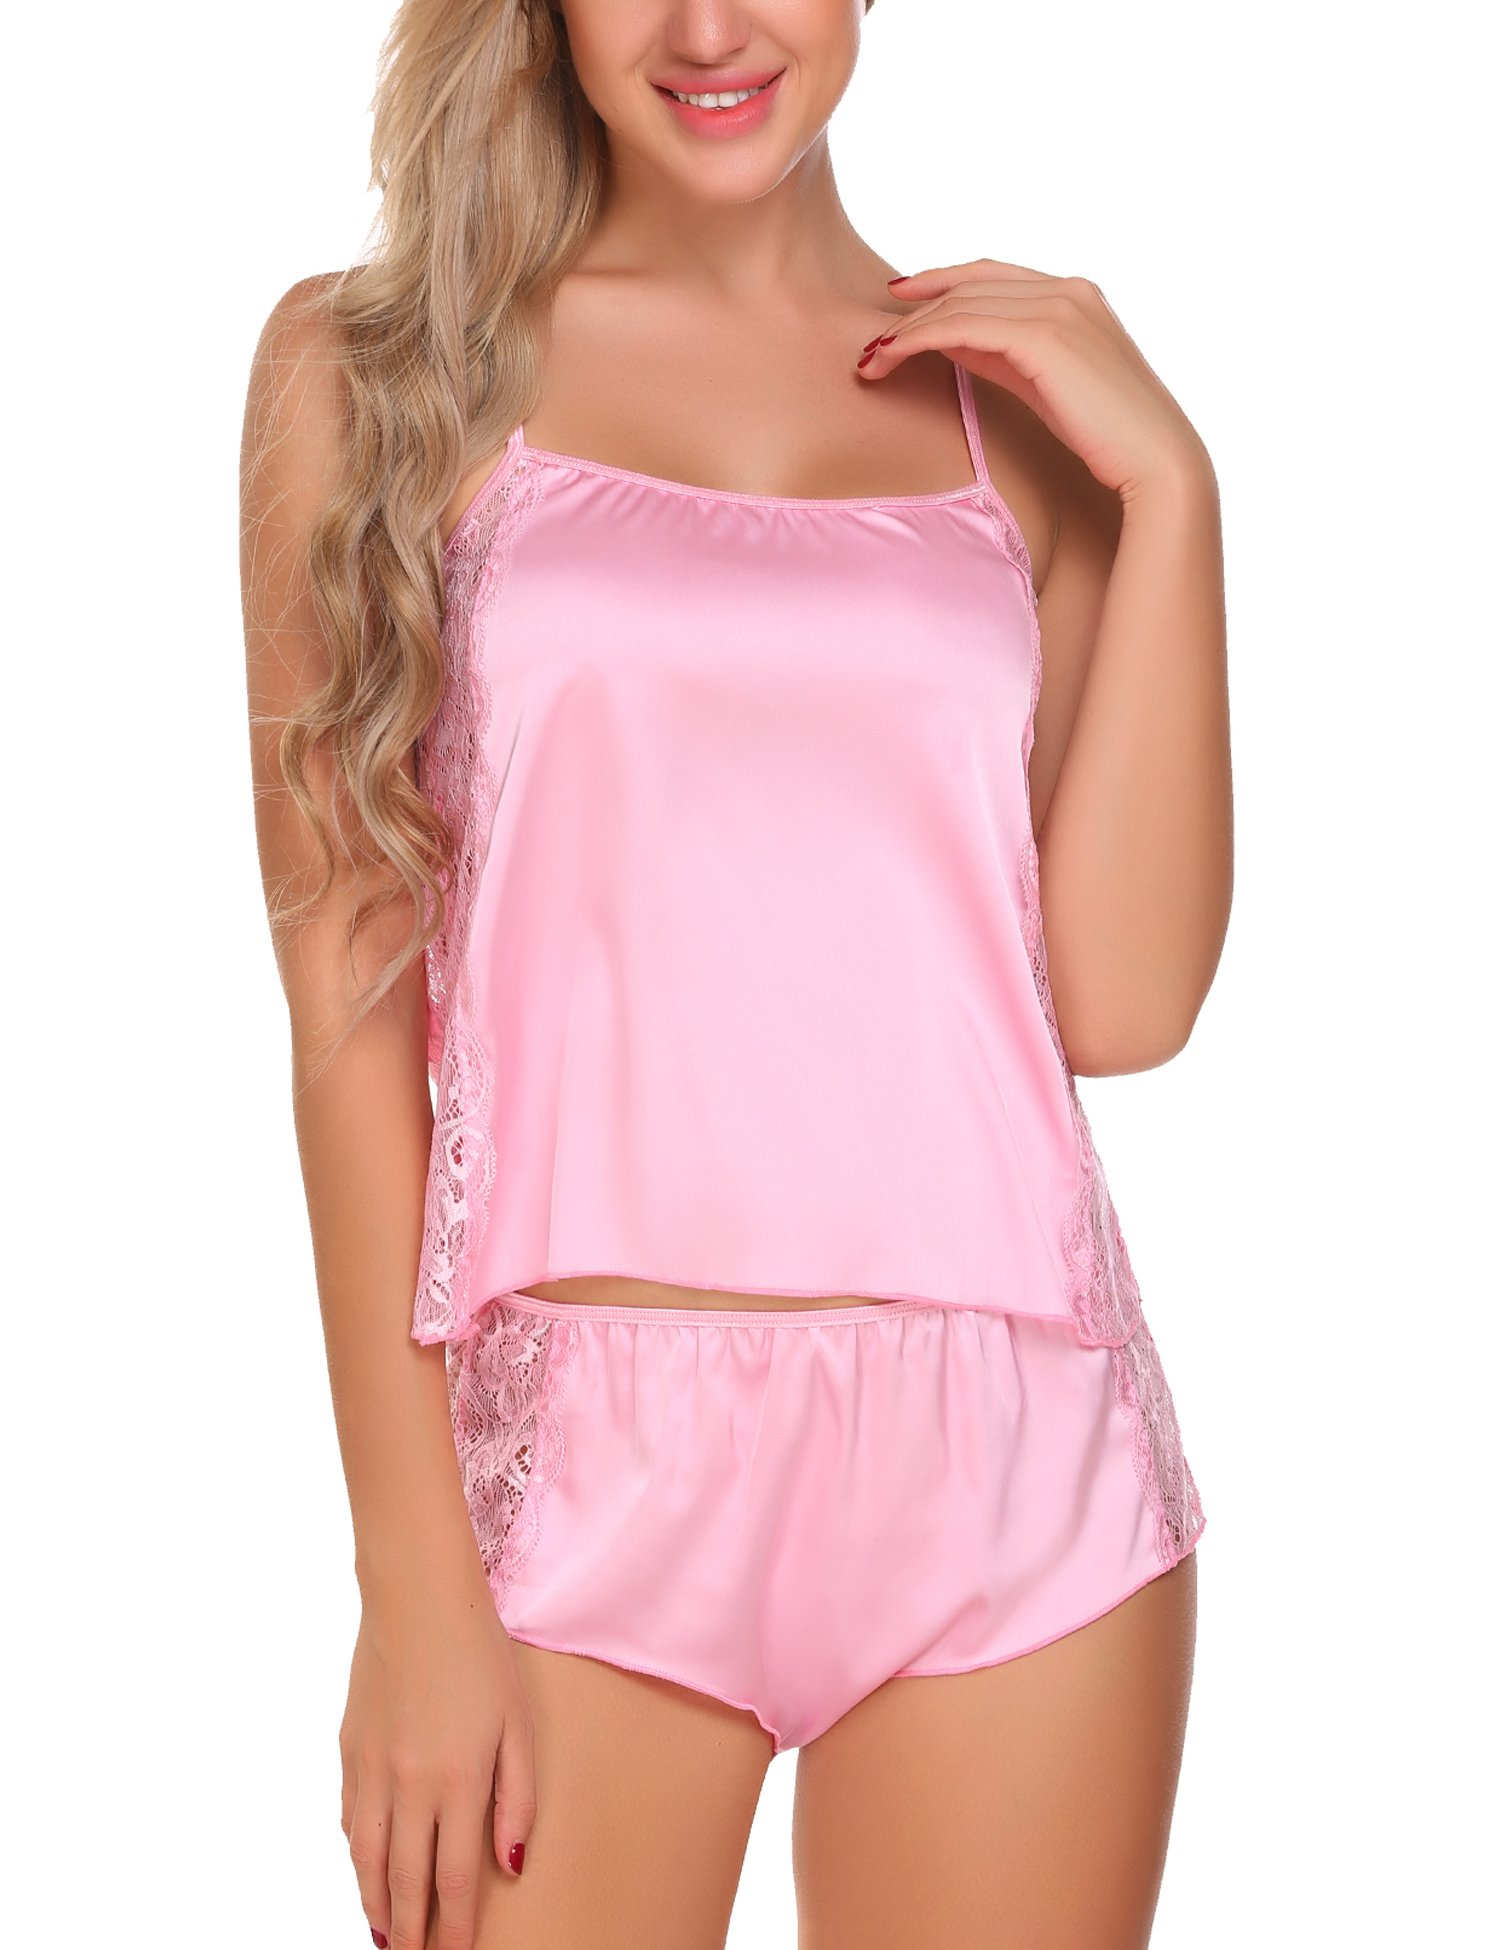 e53ad57362 Women's Satin Nightdress Negligee Babydoll Lace Lingerie Sleepwear V Neck  Spaghetti Straps Dress with G-String Sleepwear. Avidlove Nachtwäsche Damen  ...